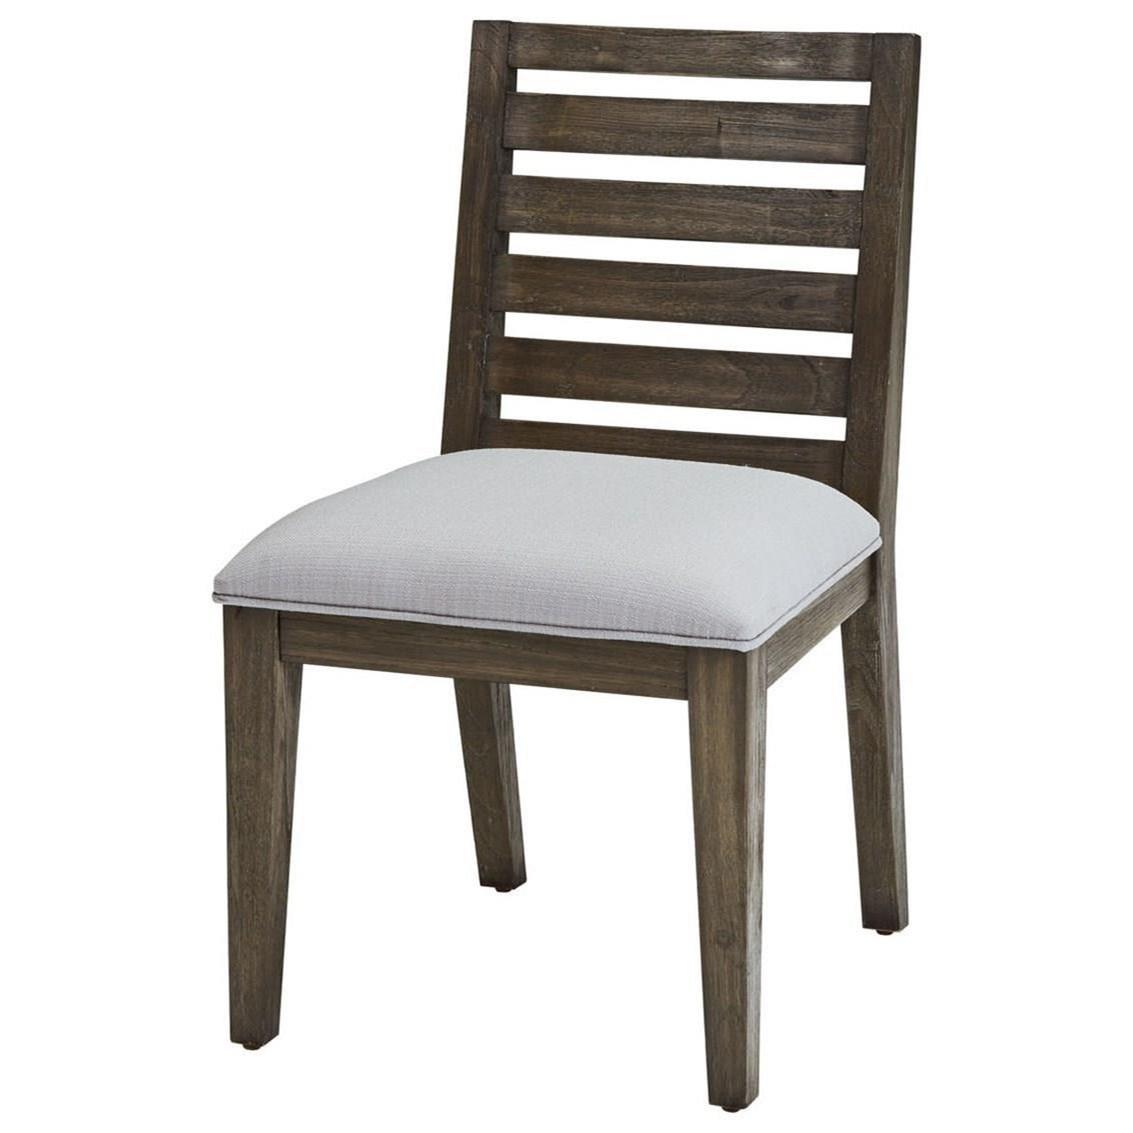 District Slat Back Side Chair by Belfort Select at Belfort Furniture